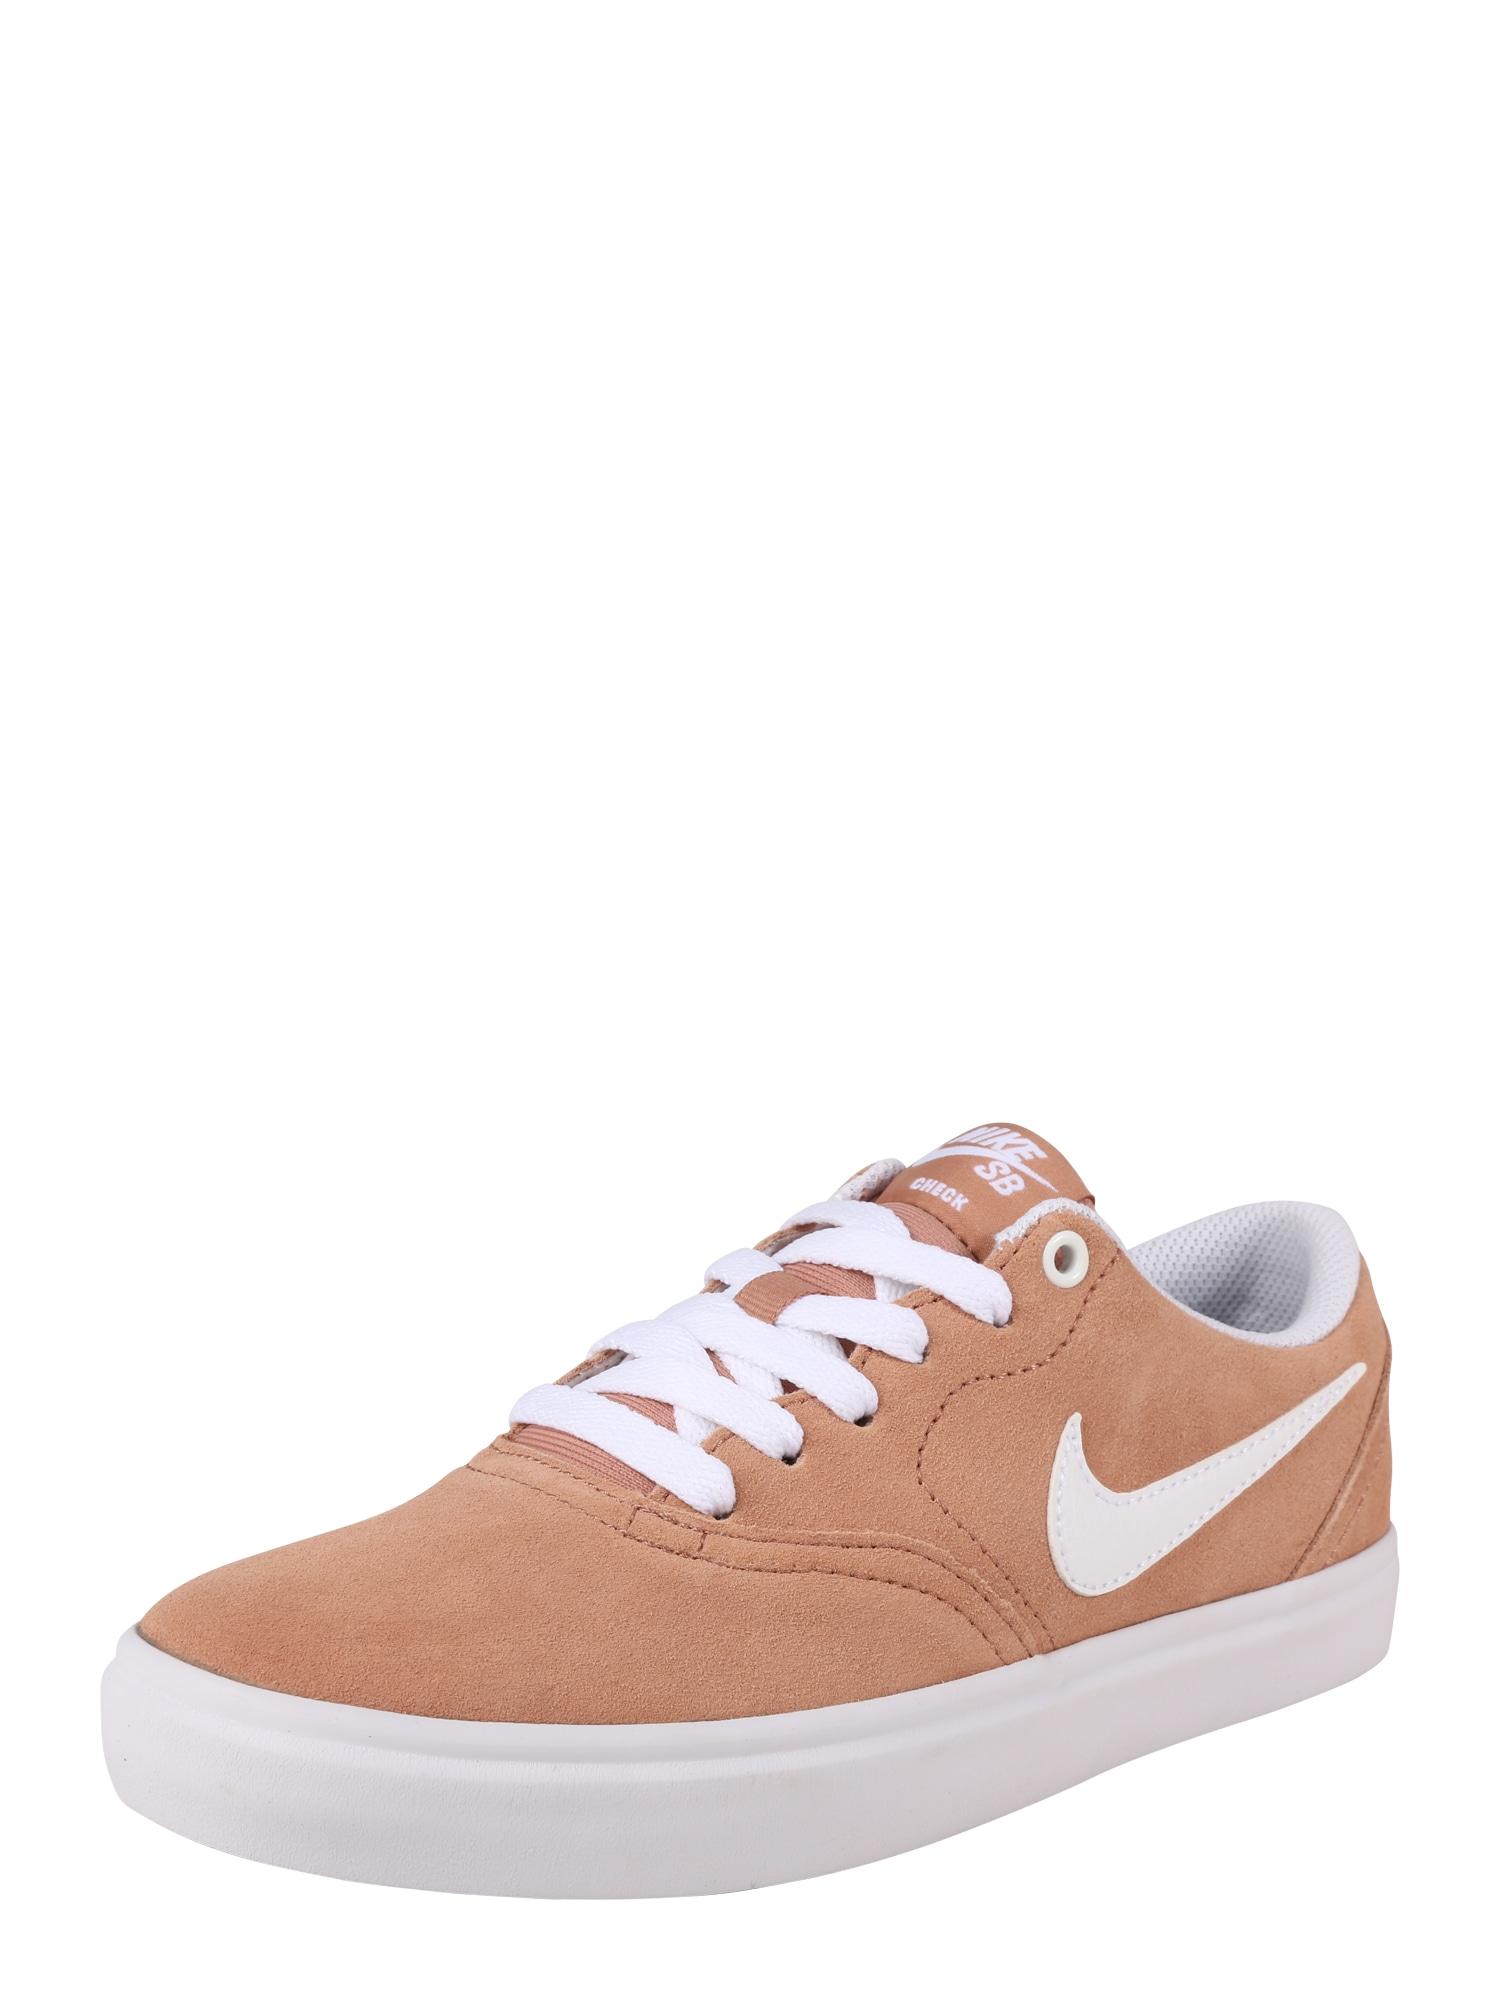 Tenisky CHECK SOLAR zlatá růže bílá Nike SB